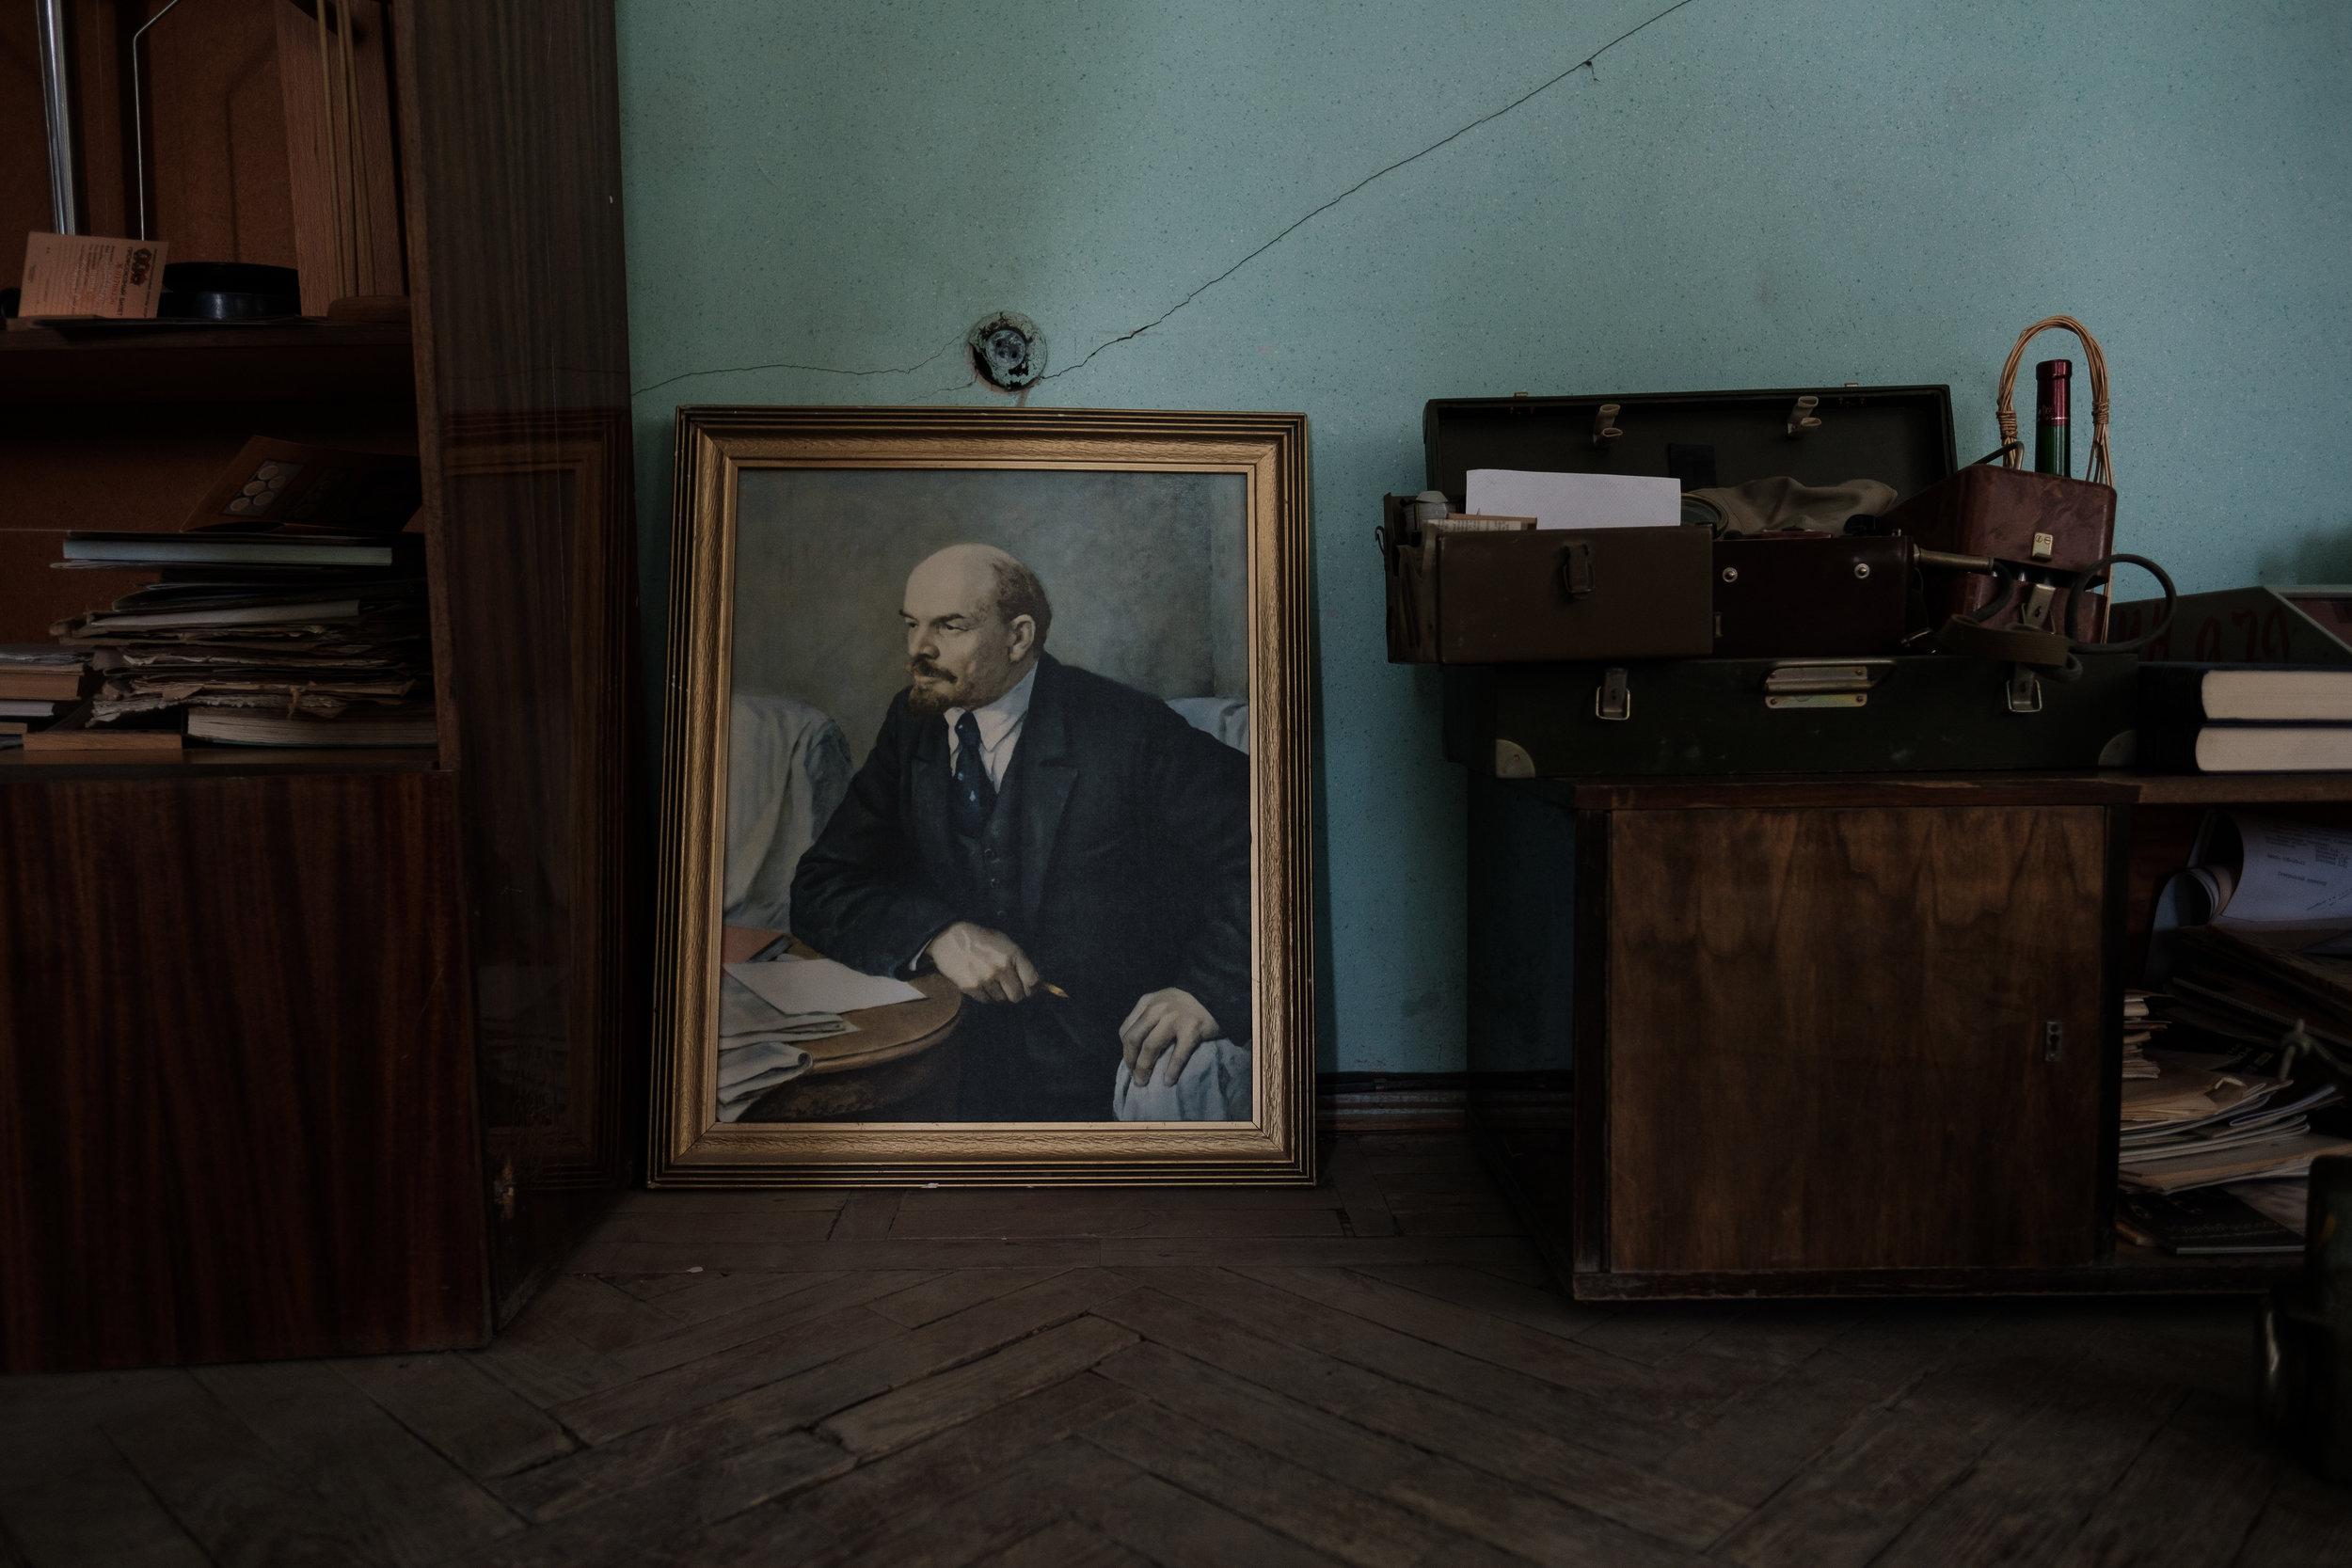 Portrait of Lenin and other Soviet memorabilia.